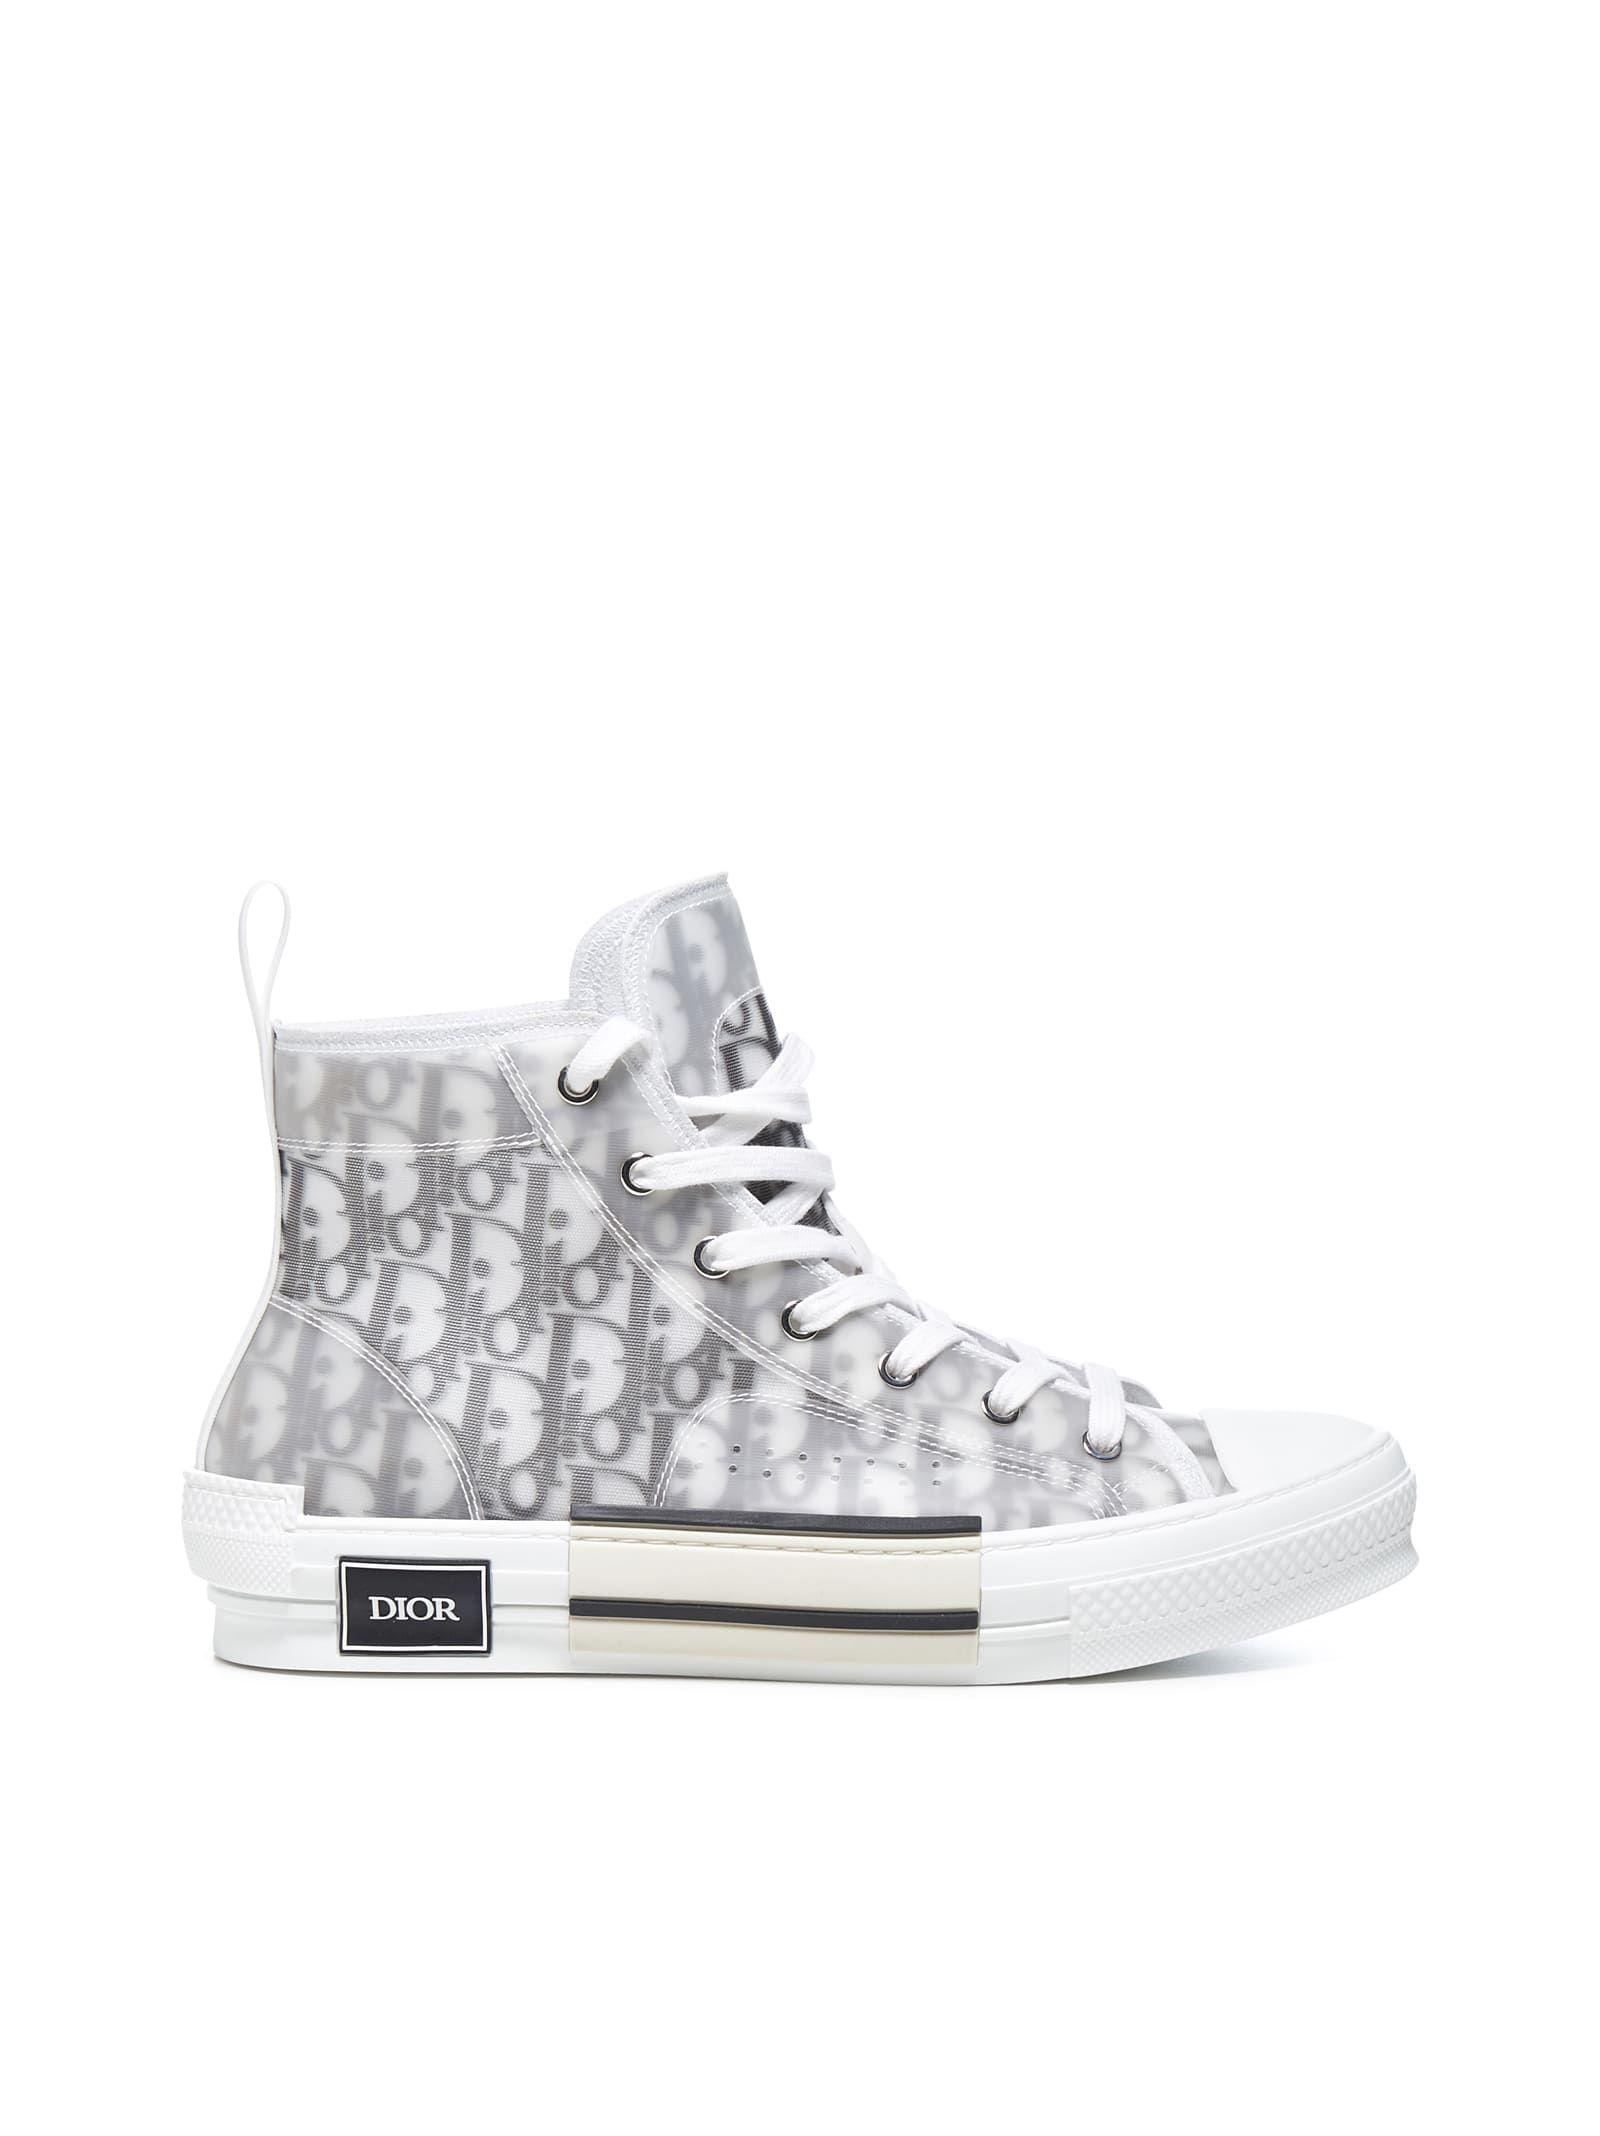 Dior Sneakers In White Black   ModeSens